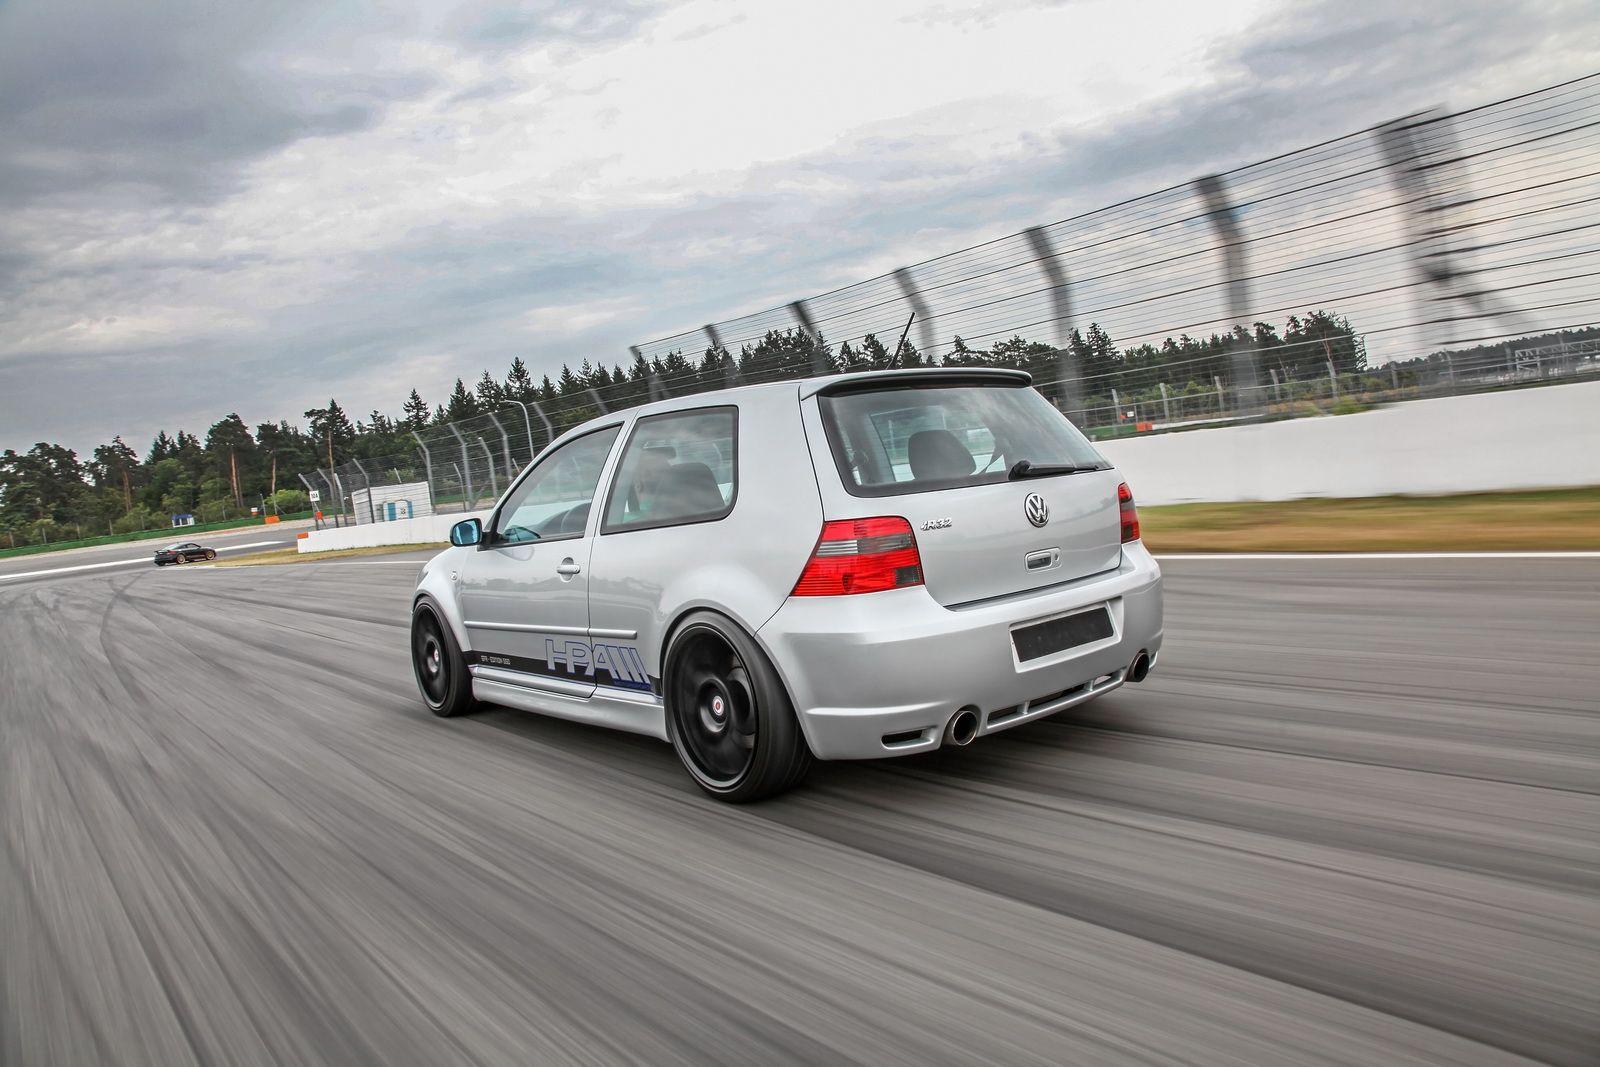 Hperformance Transforms A Golf 4 R32 Into A Serious Powerhouse Carscoops Volkswagen Golf Golf Golf 4